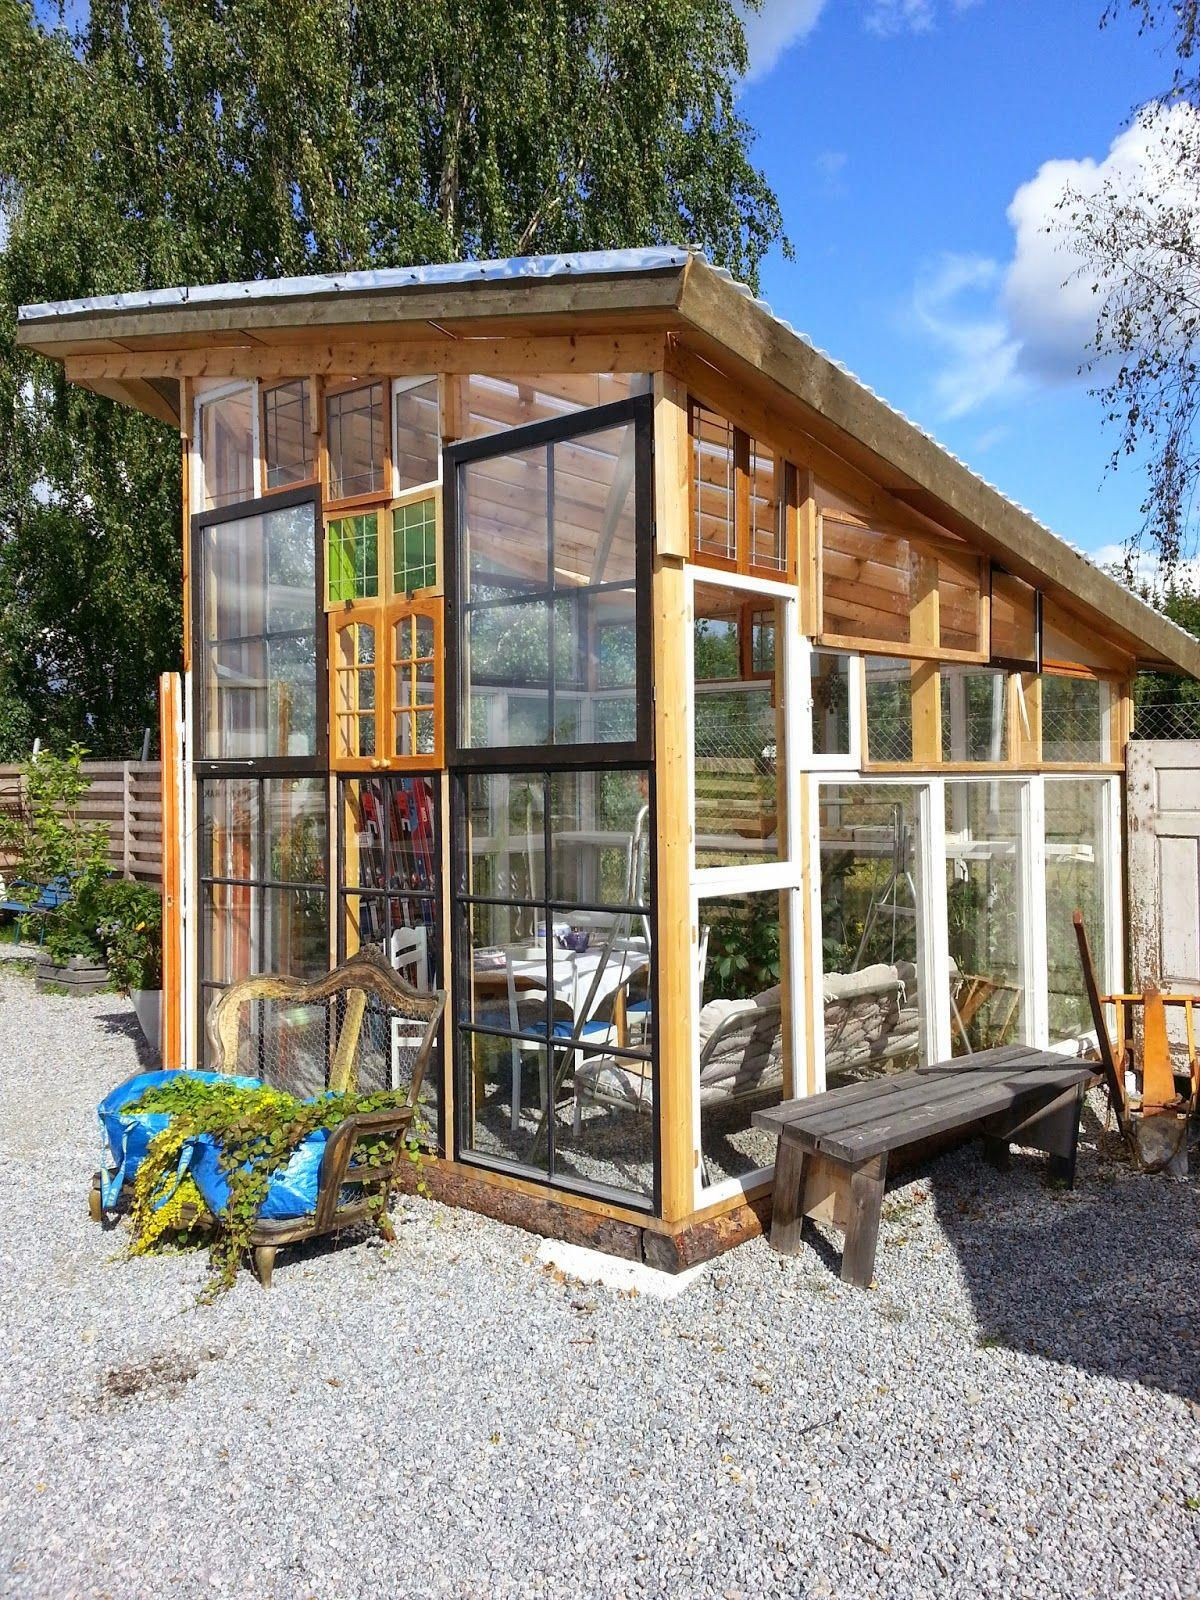 Photo of abri de jardin idées intérieur #gardensheddesigns